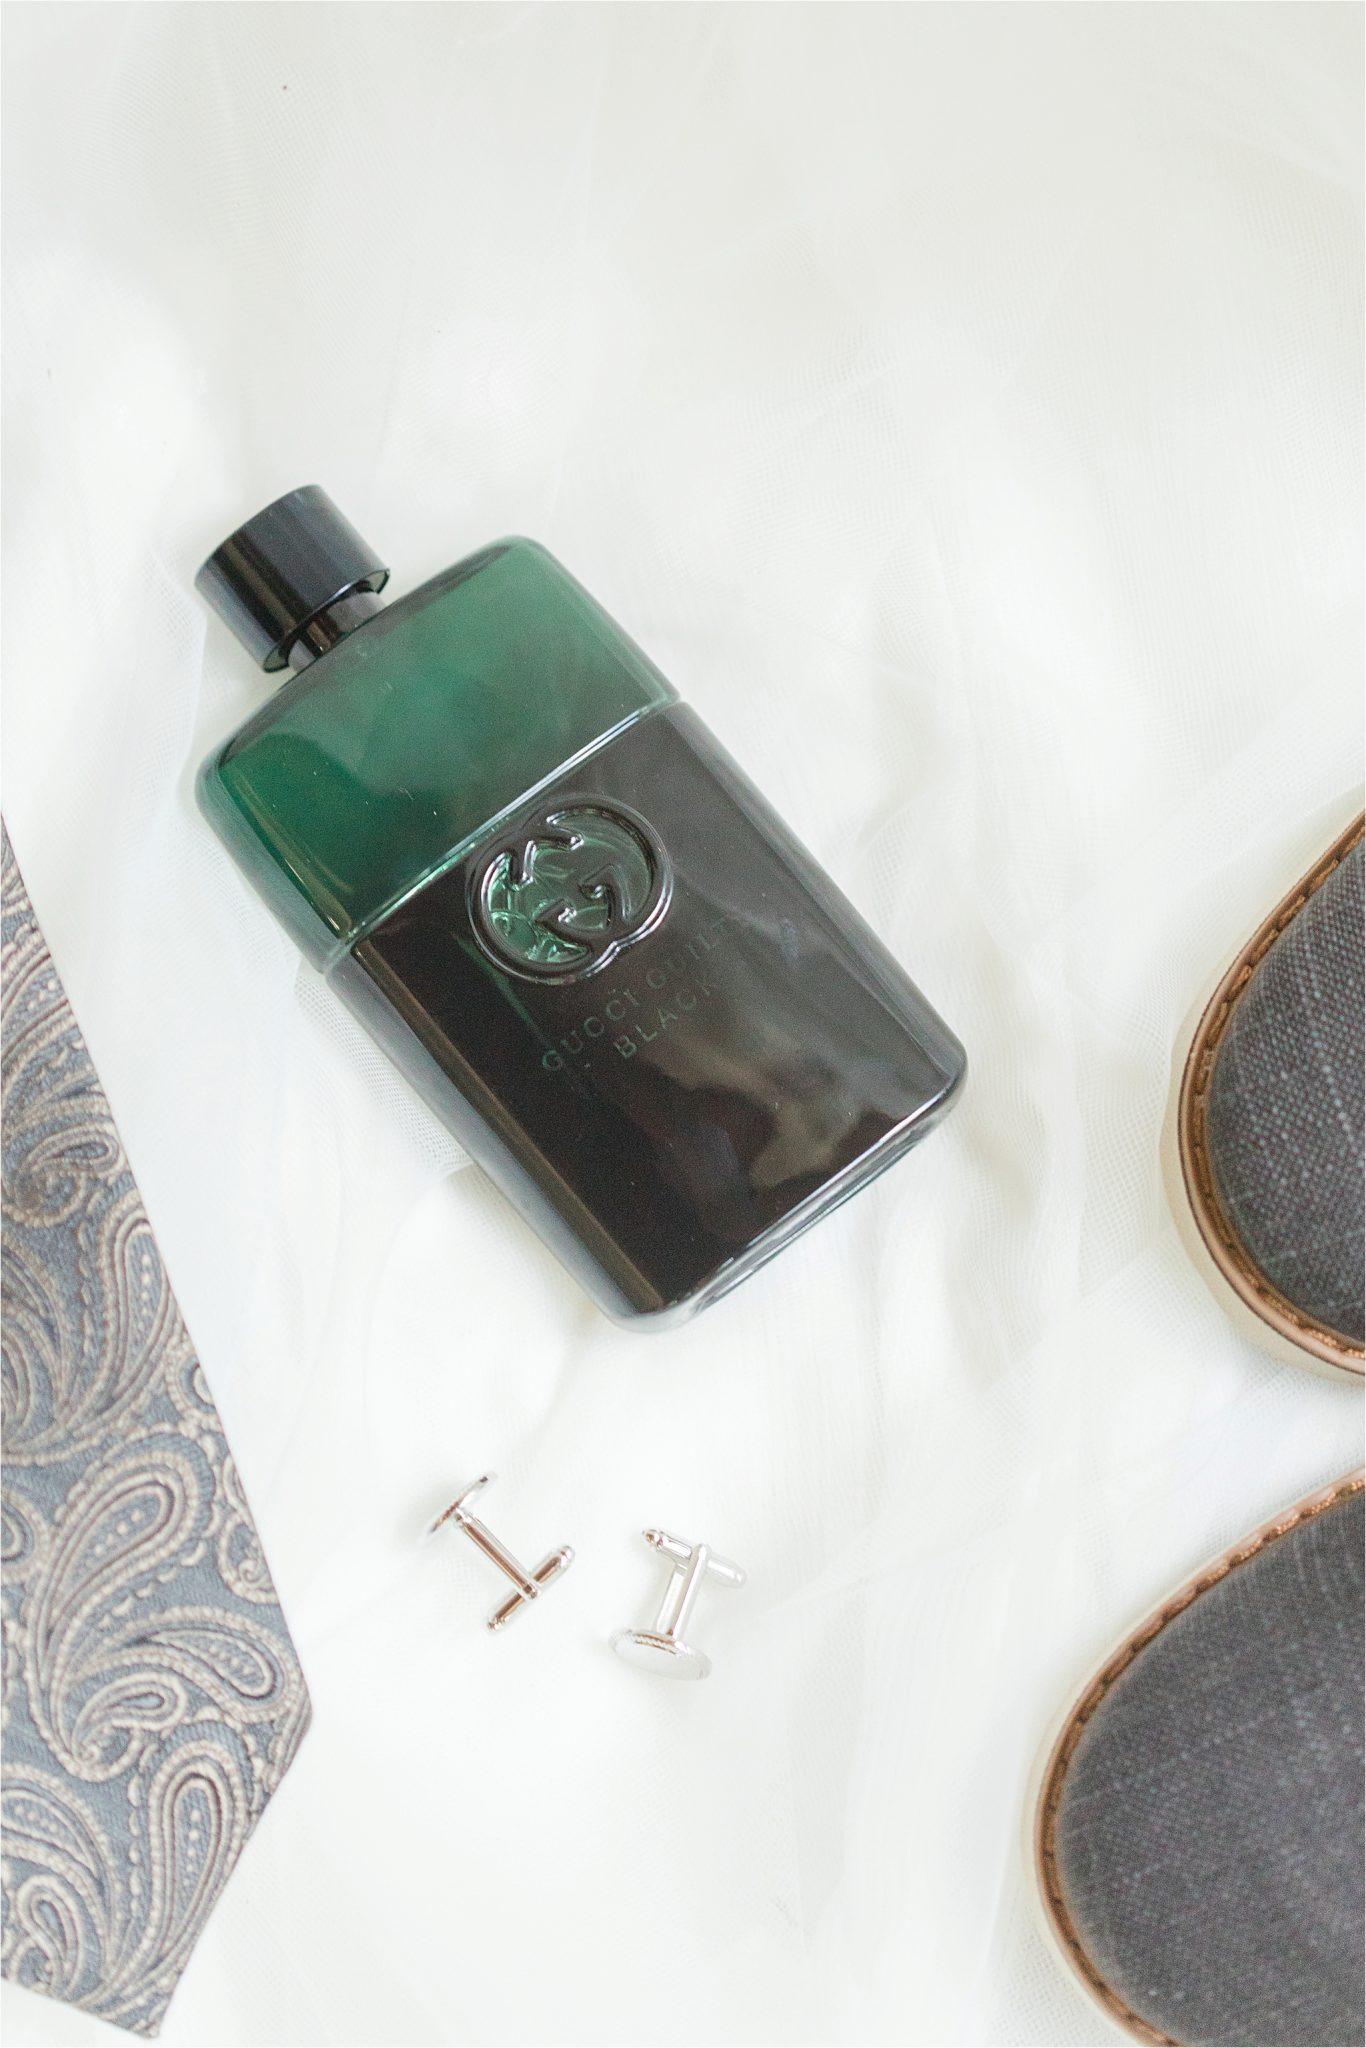 Paisley tie-groom details-gucci guilty black-cologne-bottle